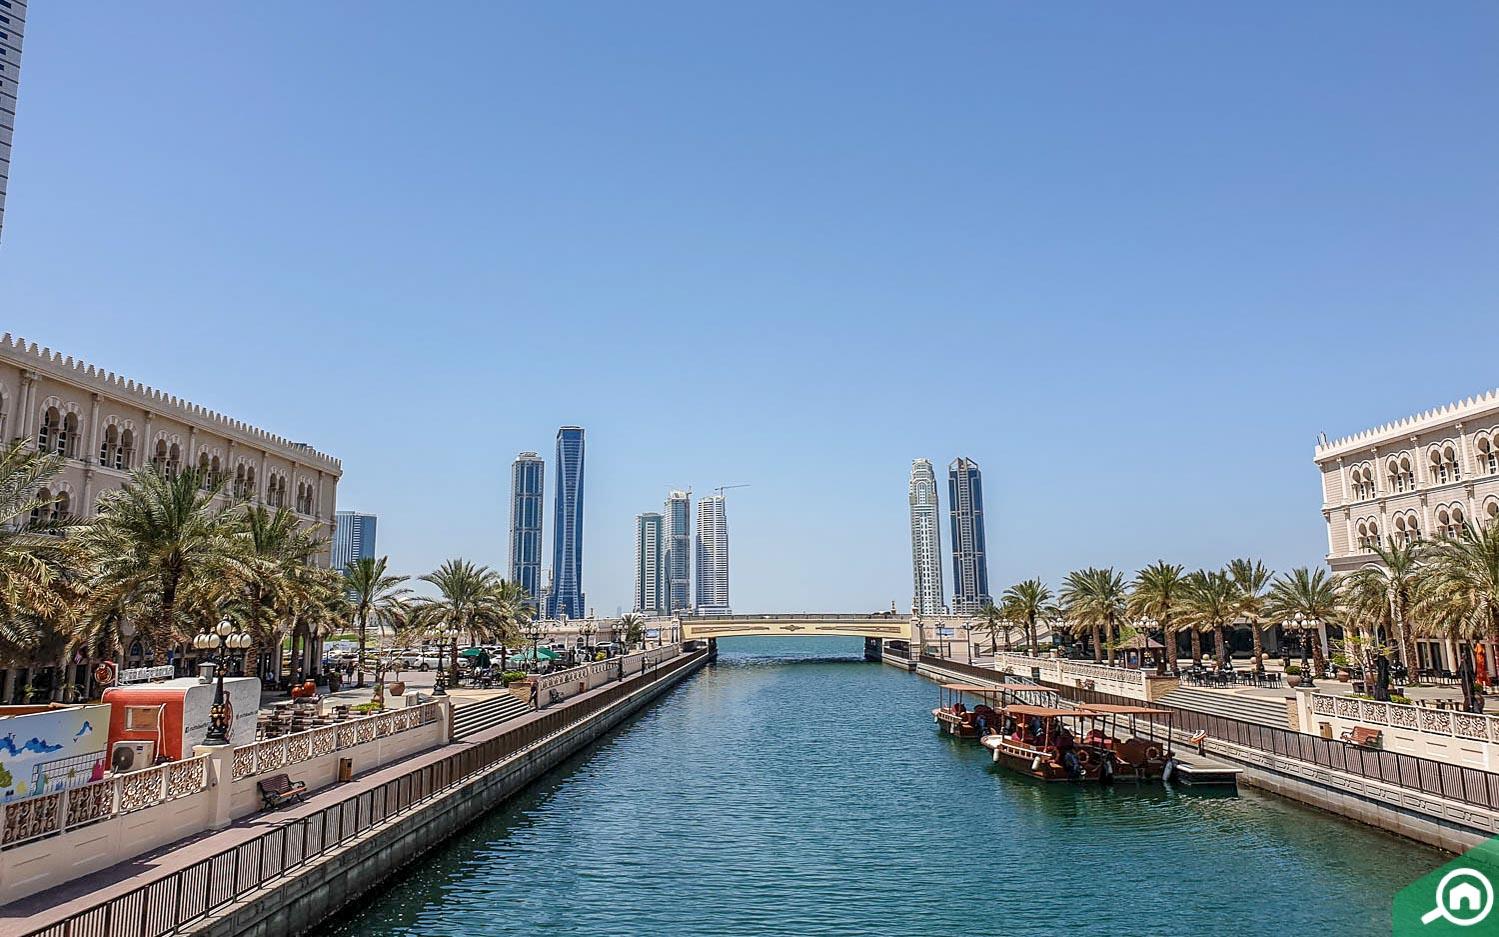 Al Qasba Canal in Sharjah